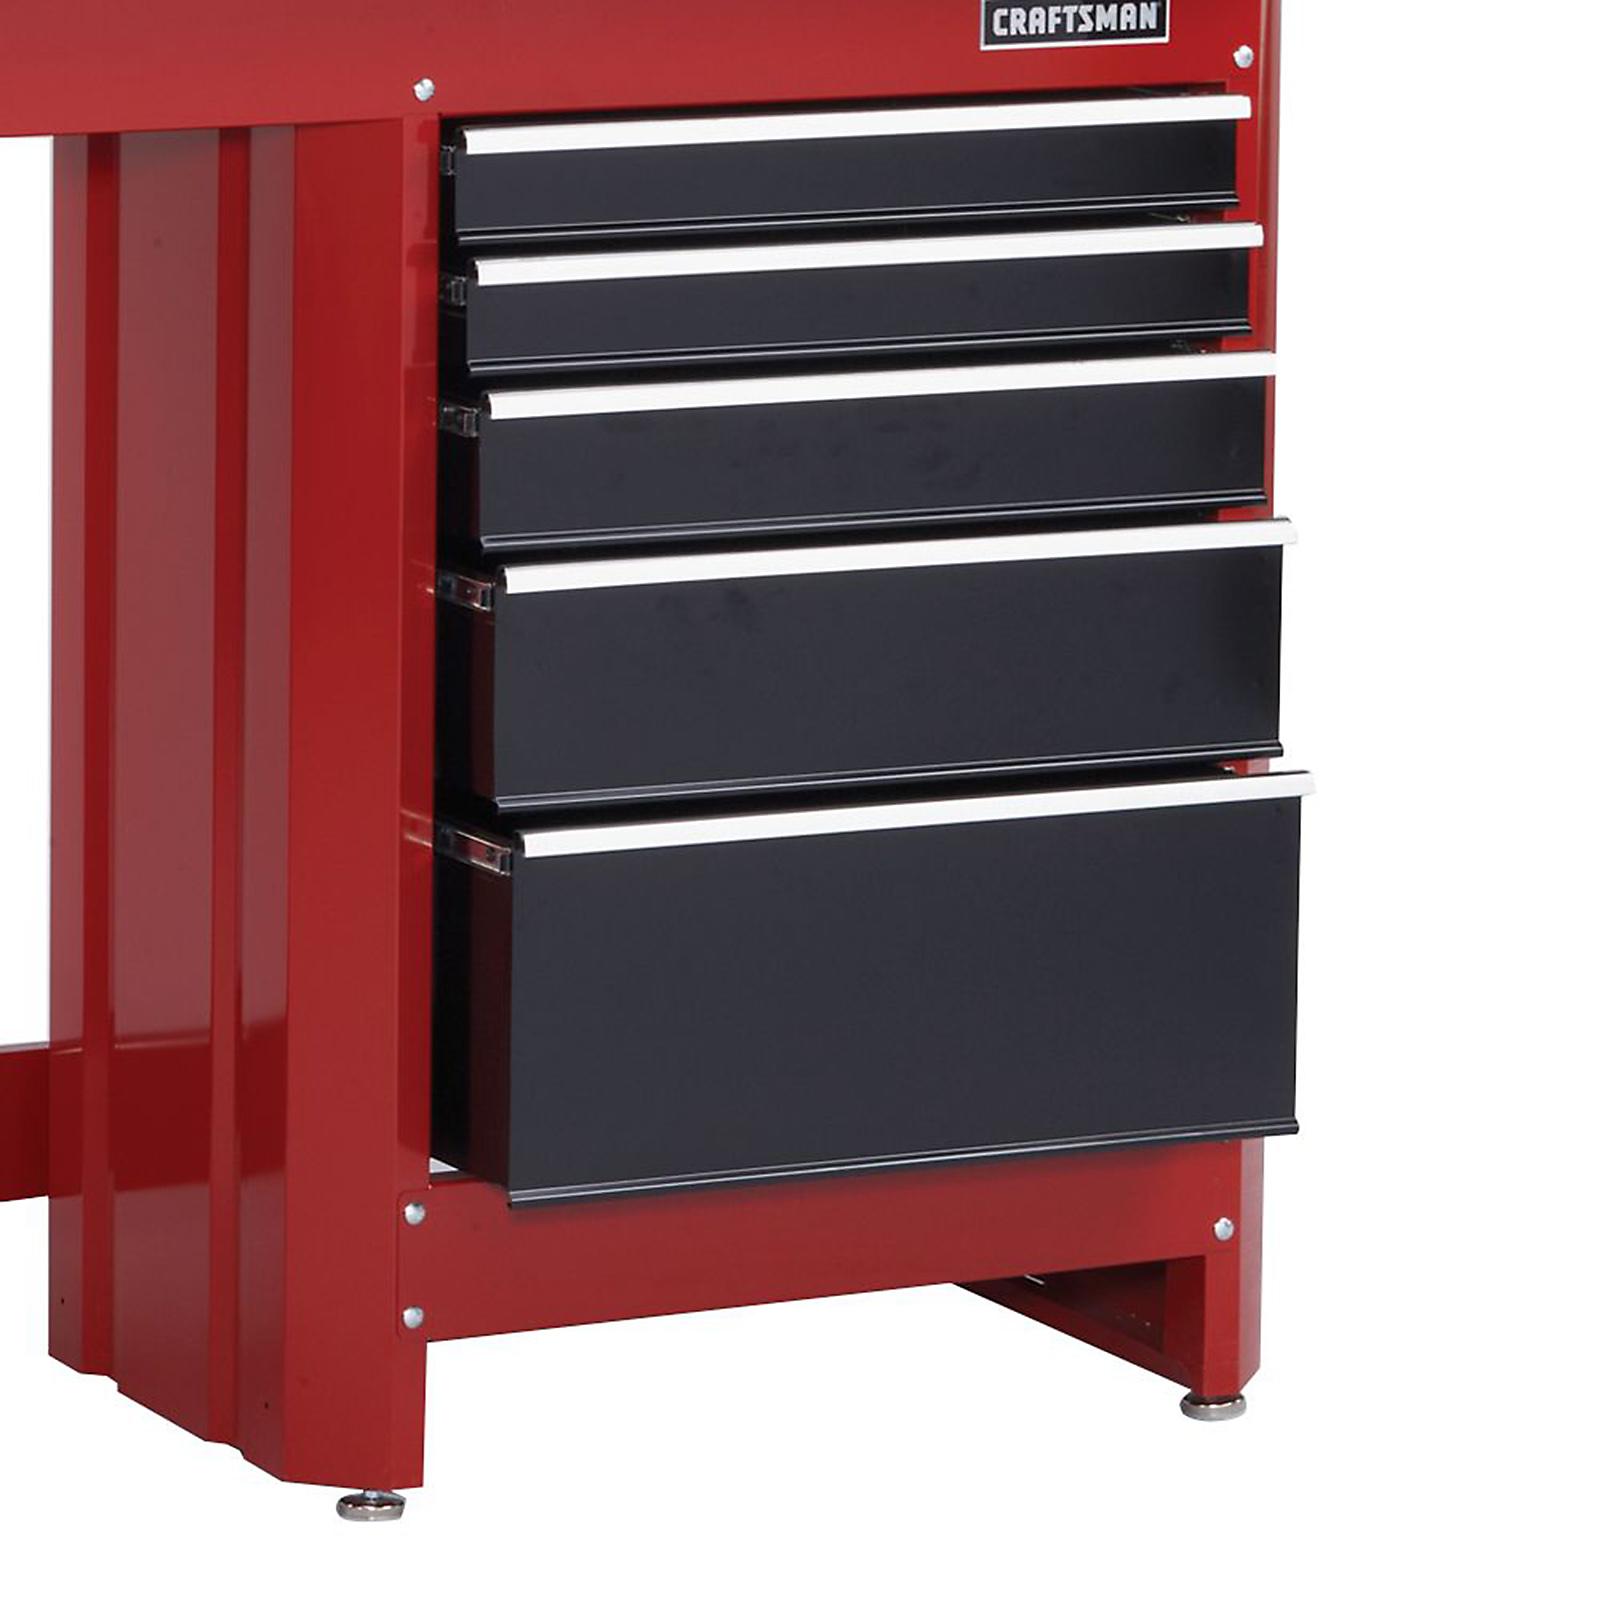 Craftsman 5 Drawer Workbench Module Red Black Shop